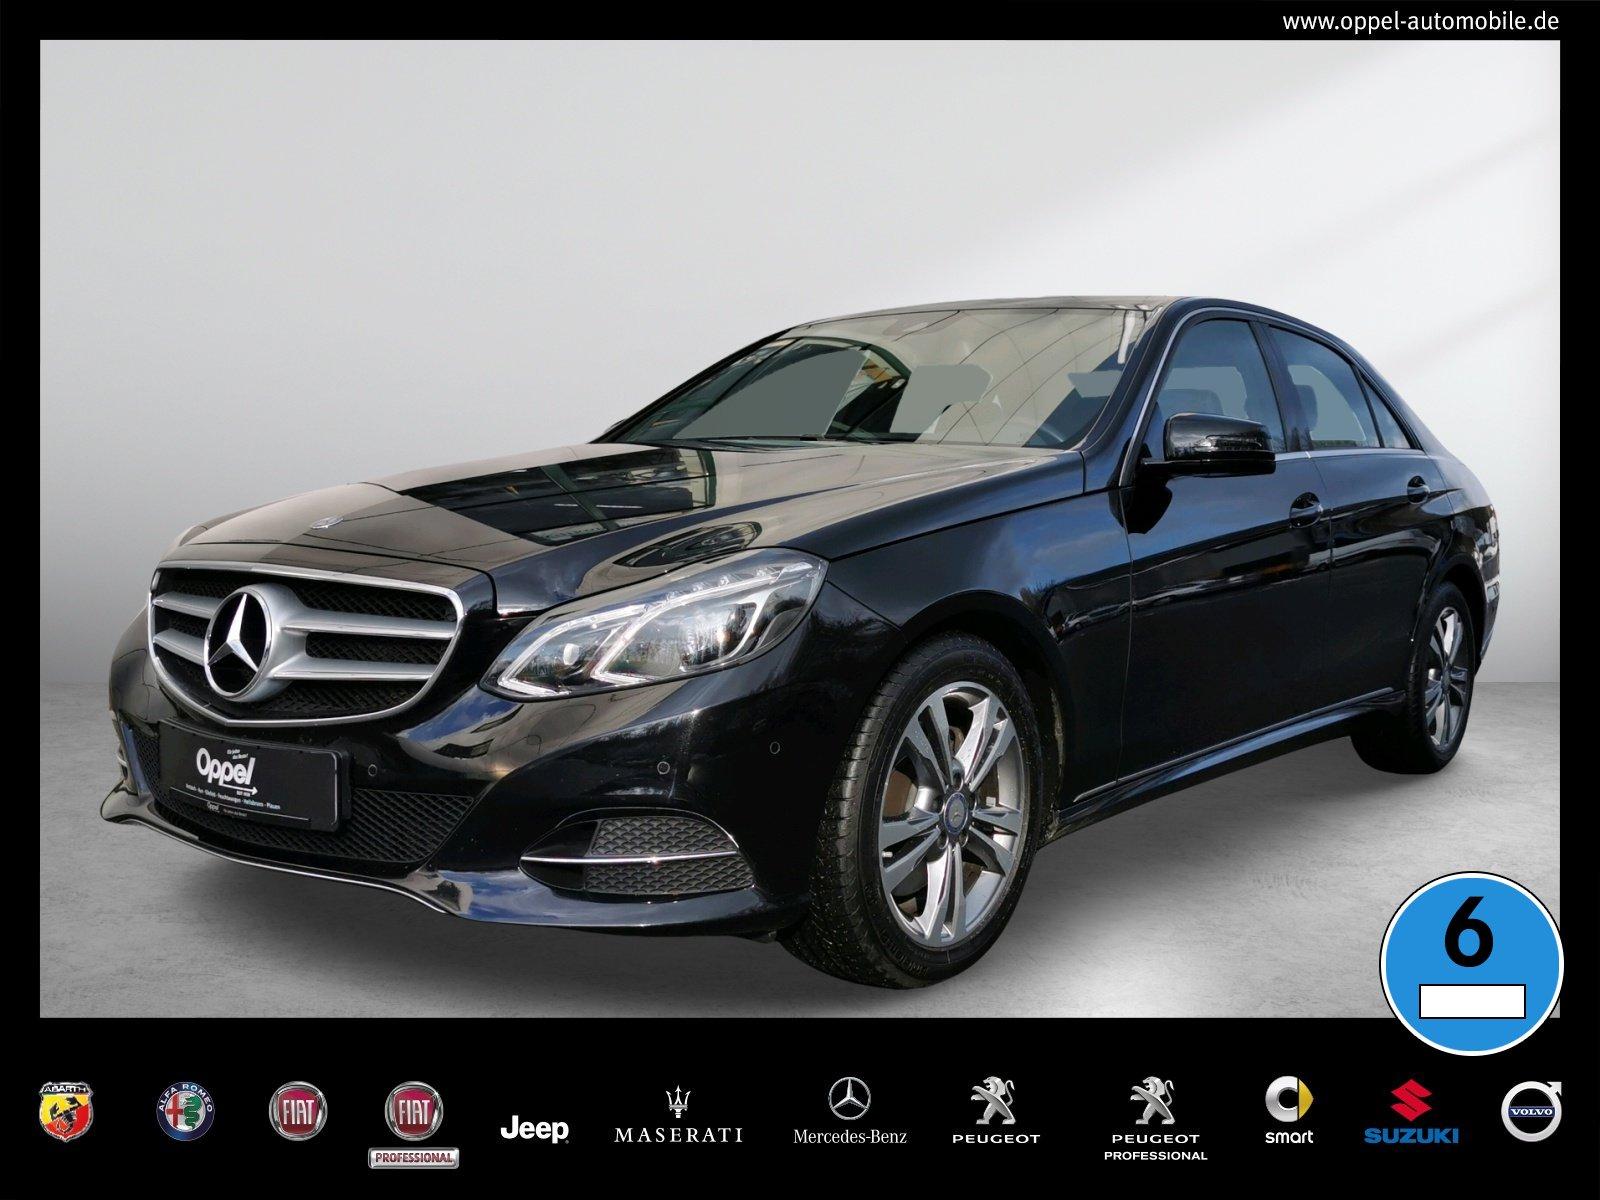 Mercedes-Benz E 250 ++NAVI++KLIMA+TEMPOMAT+SITZ-HZG+LED+RADIO+, Jahr 2016, Benzin